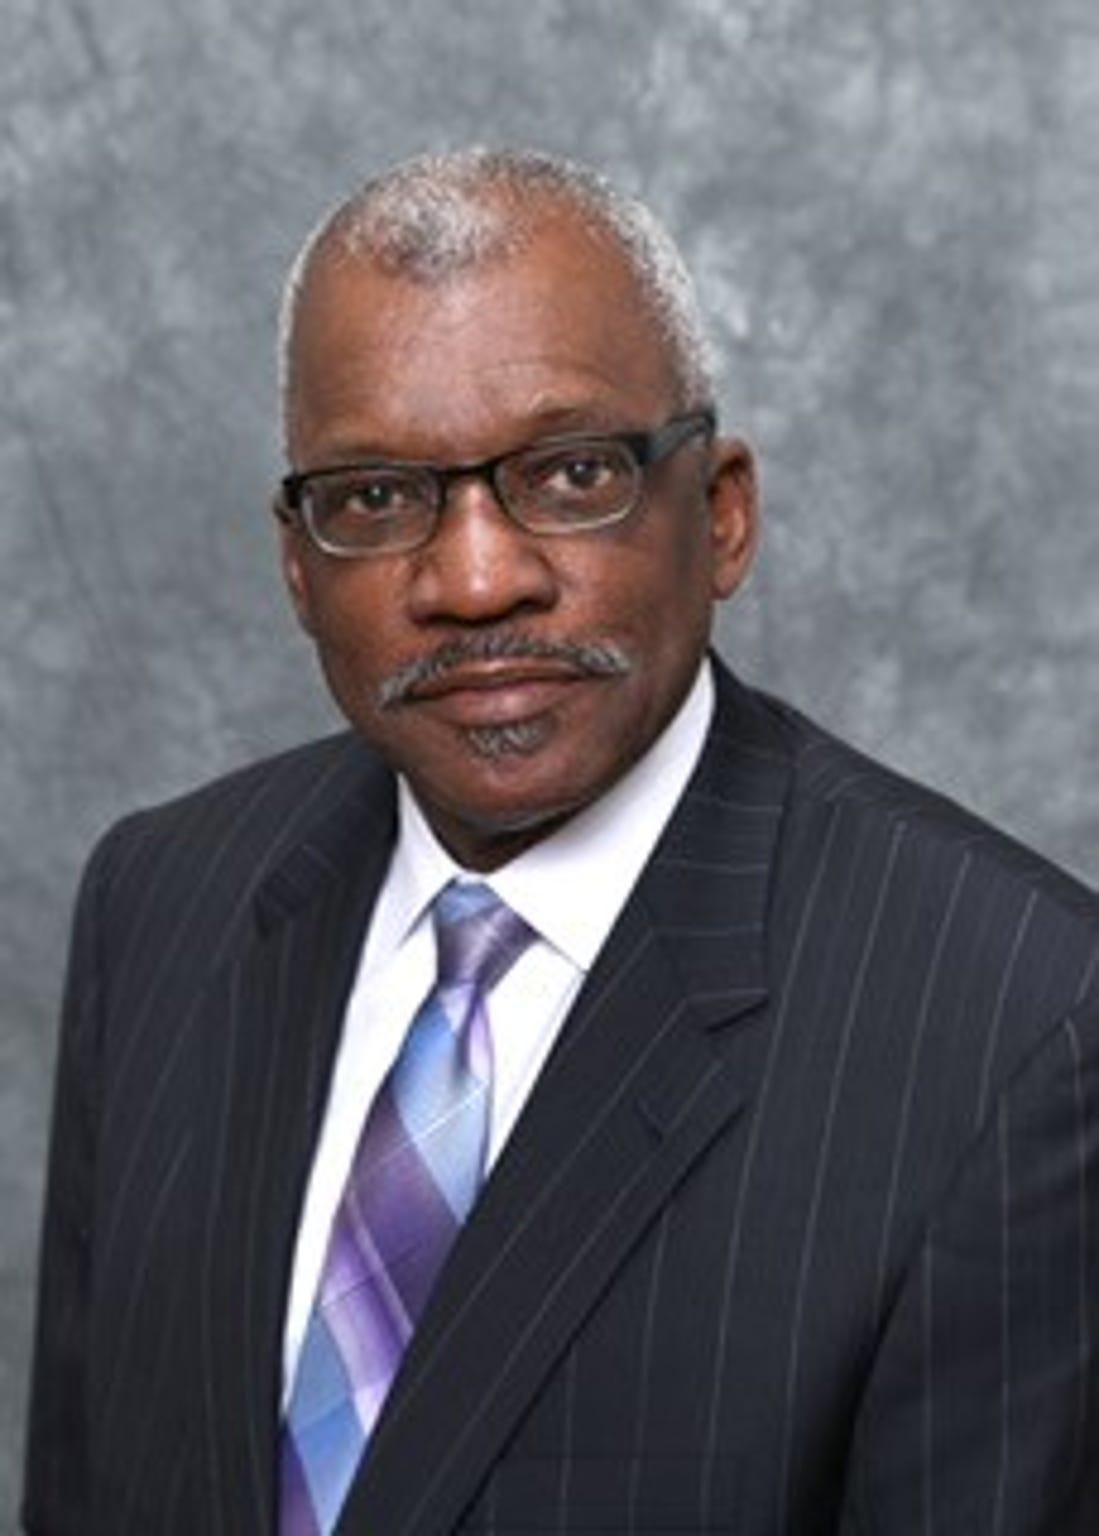 Ronald Davis, a Montgomery pastor, will run for mayor